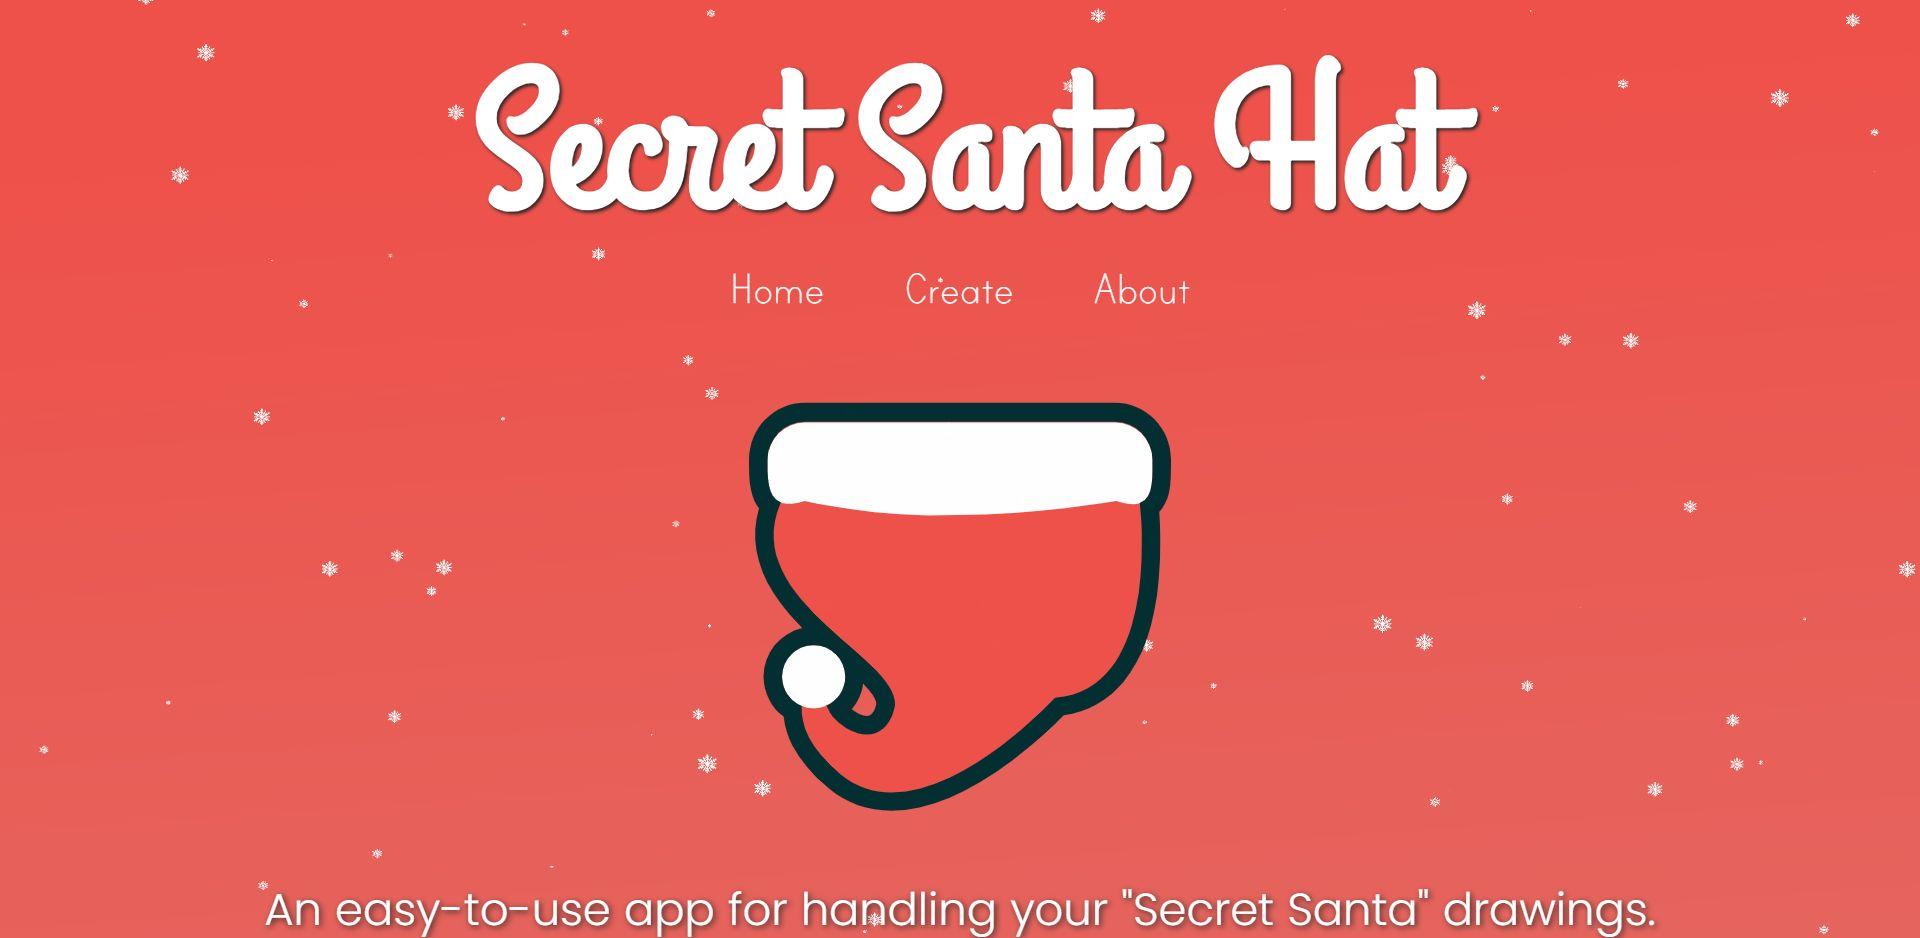 SecretSantaHat .com - Draw Names